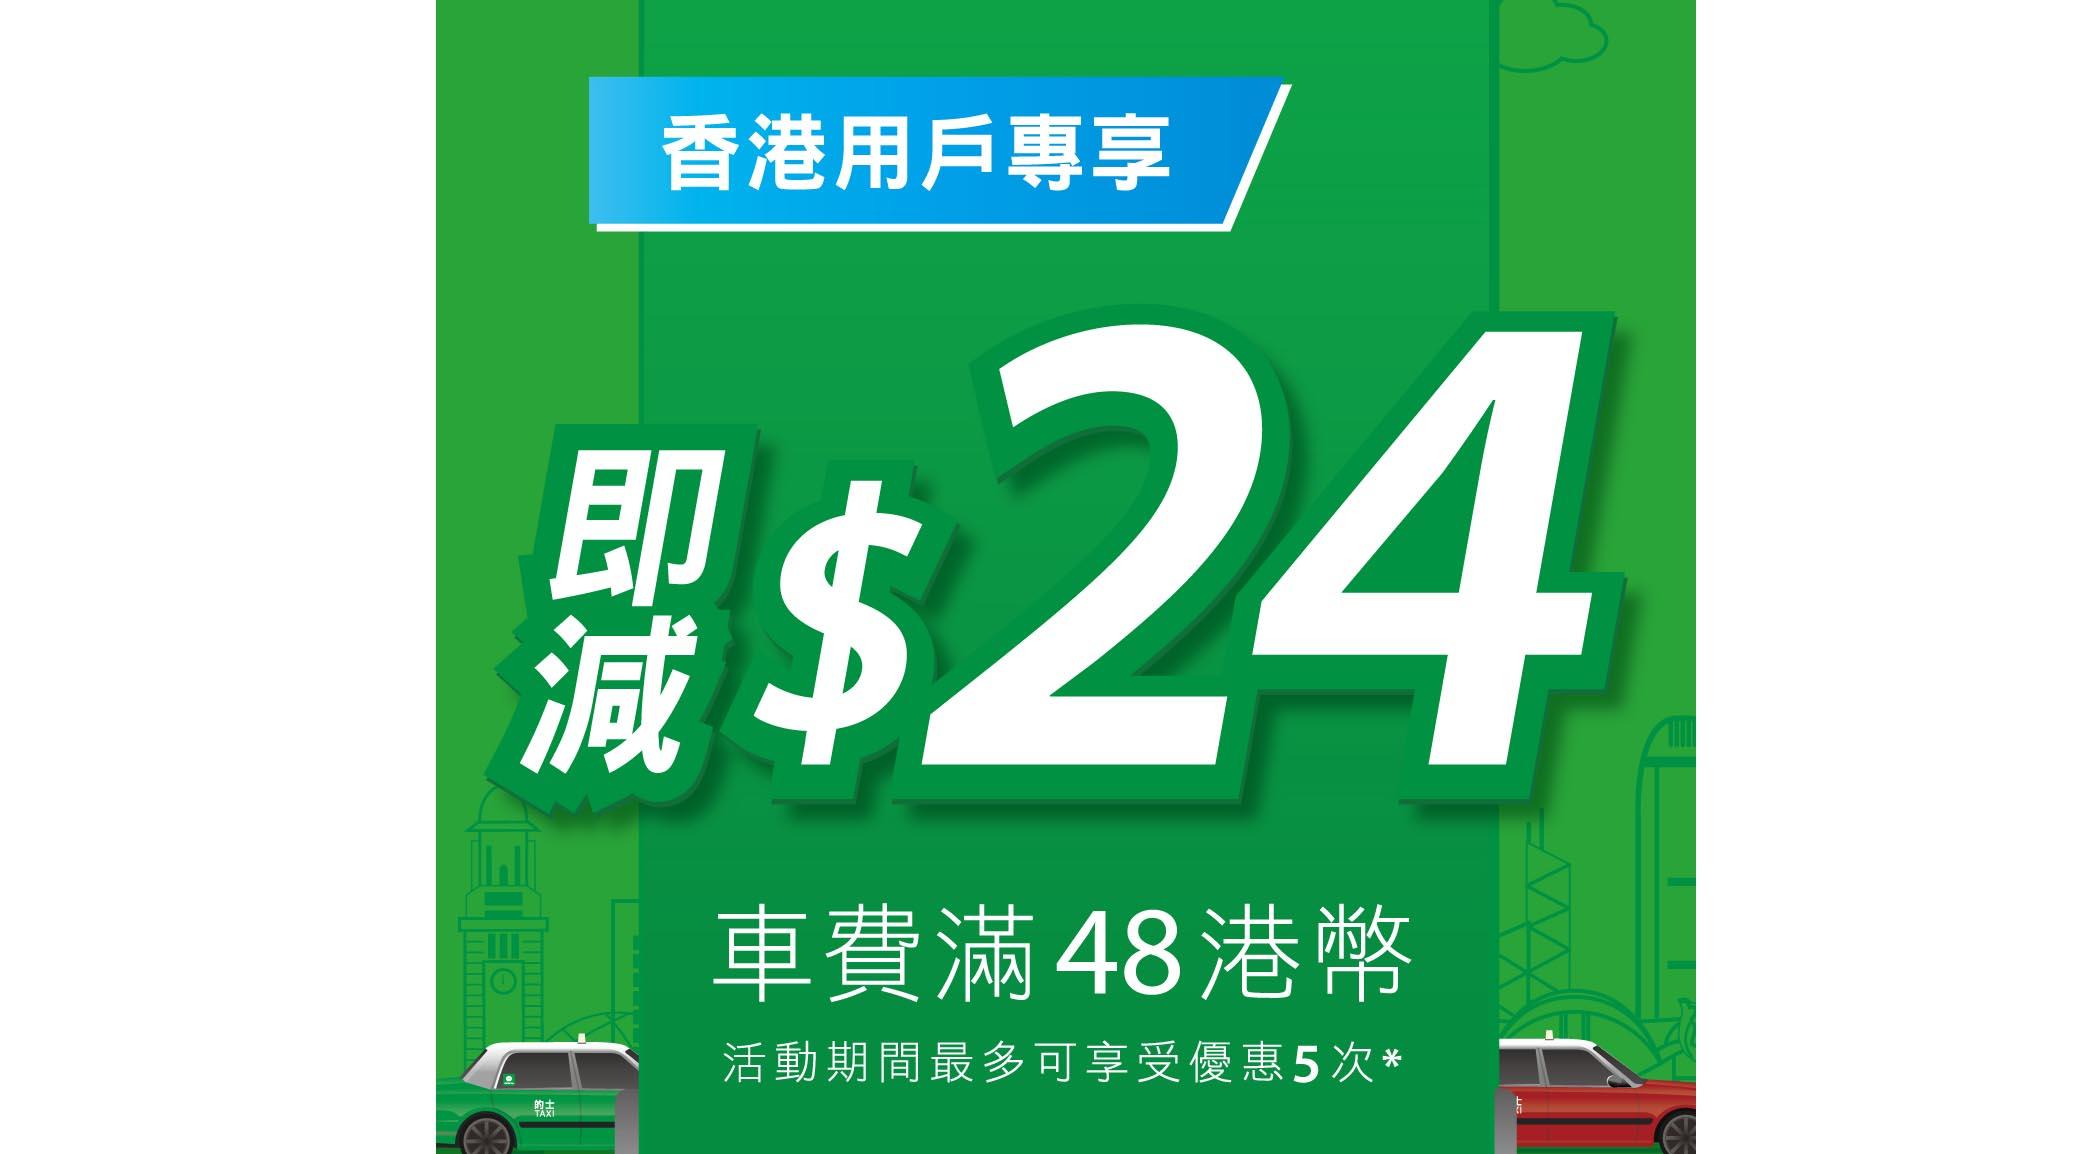 WeChat Pay HK 的士優惠再來搭的士優惠最高 HK$120